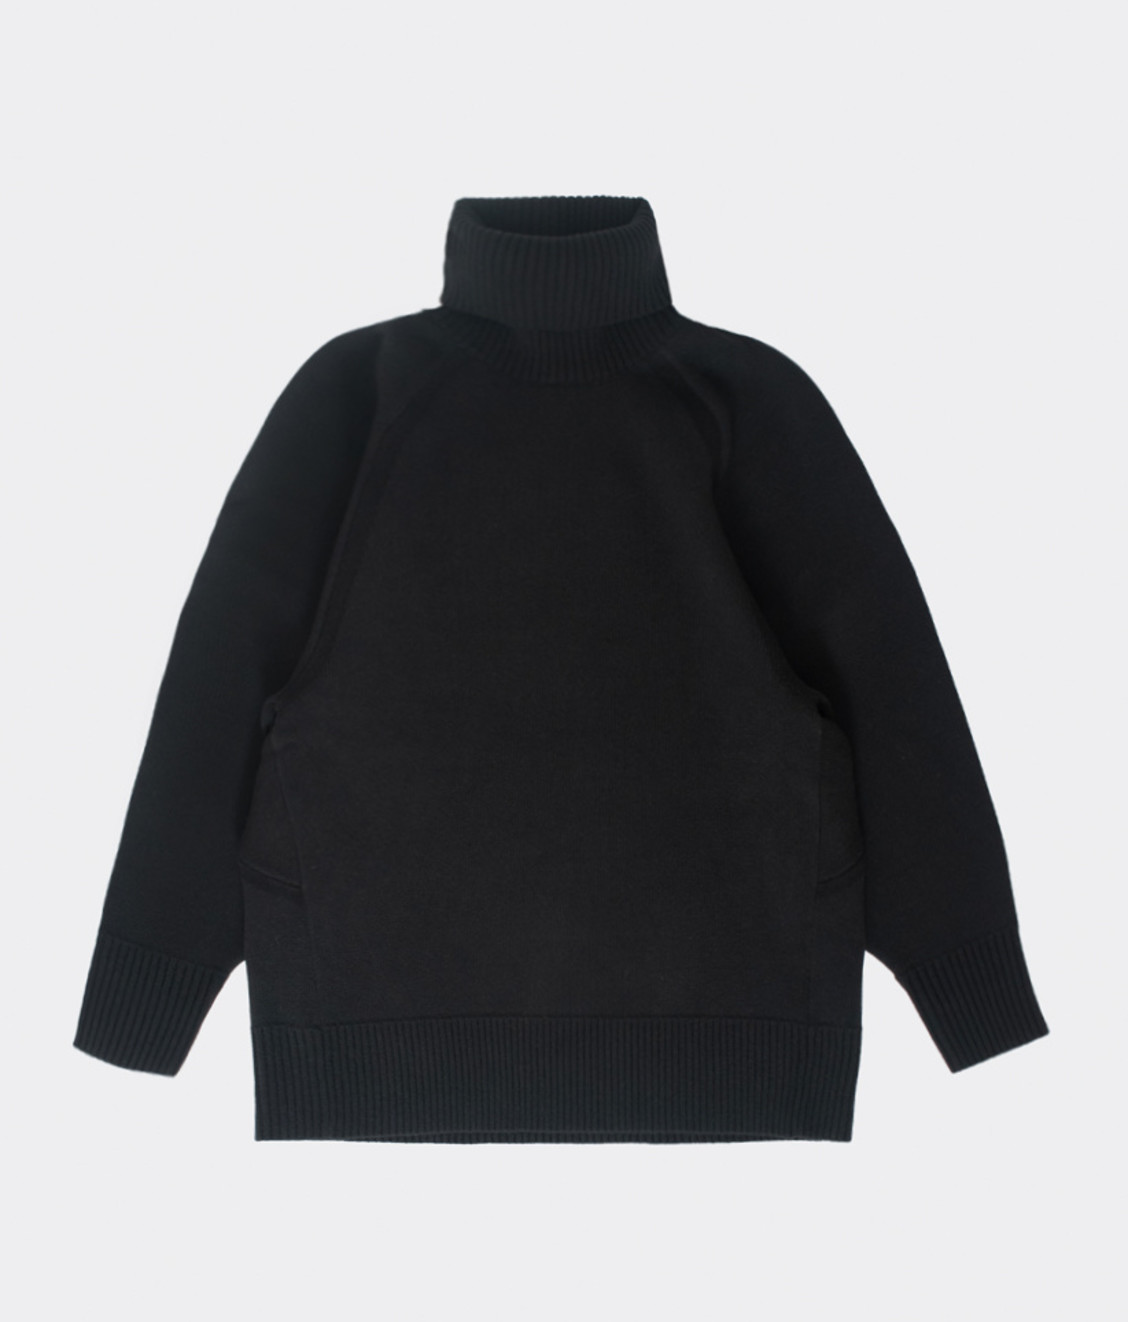 Y-3 Y-3 Winter Knit High Neck Sweat Black